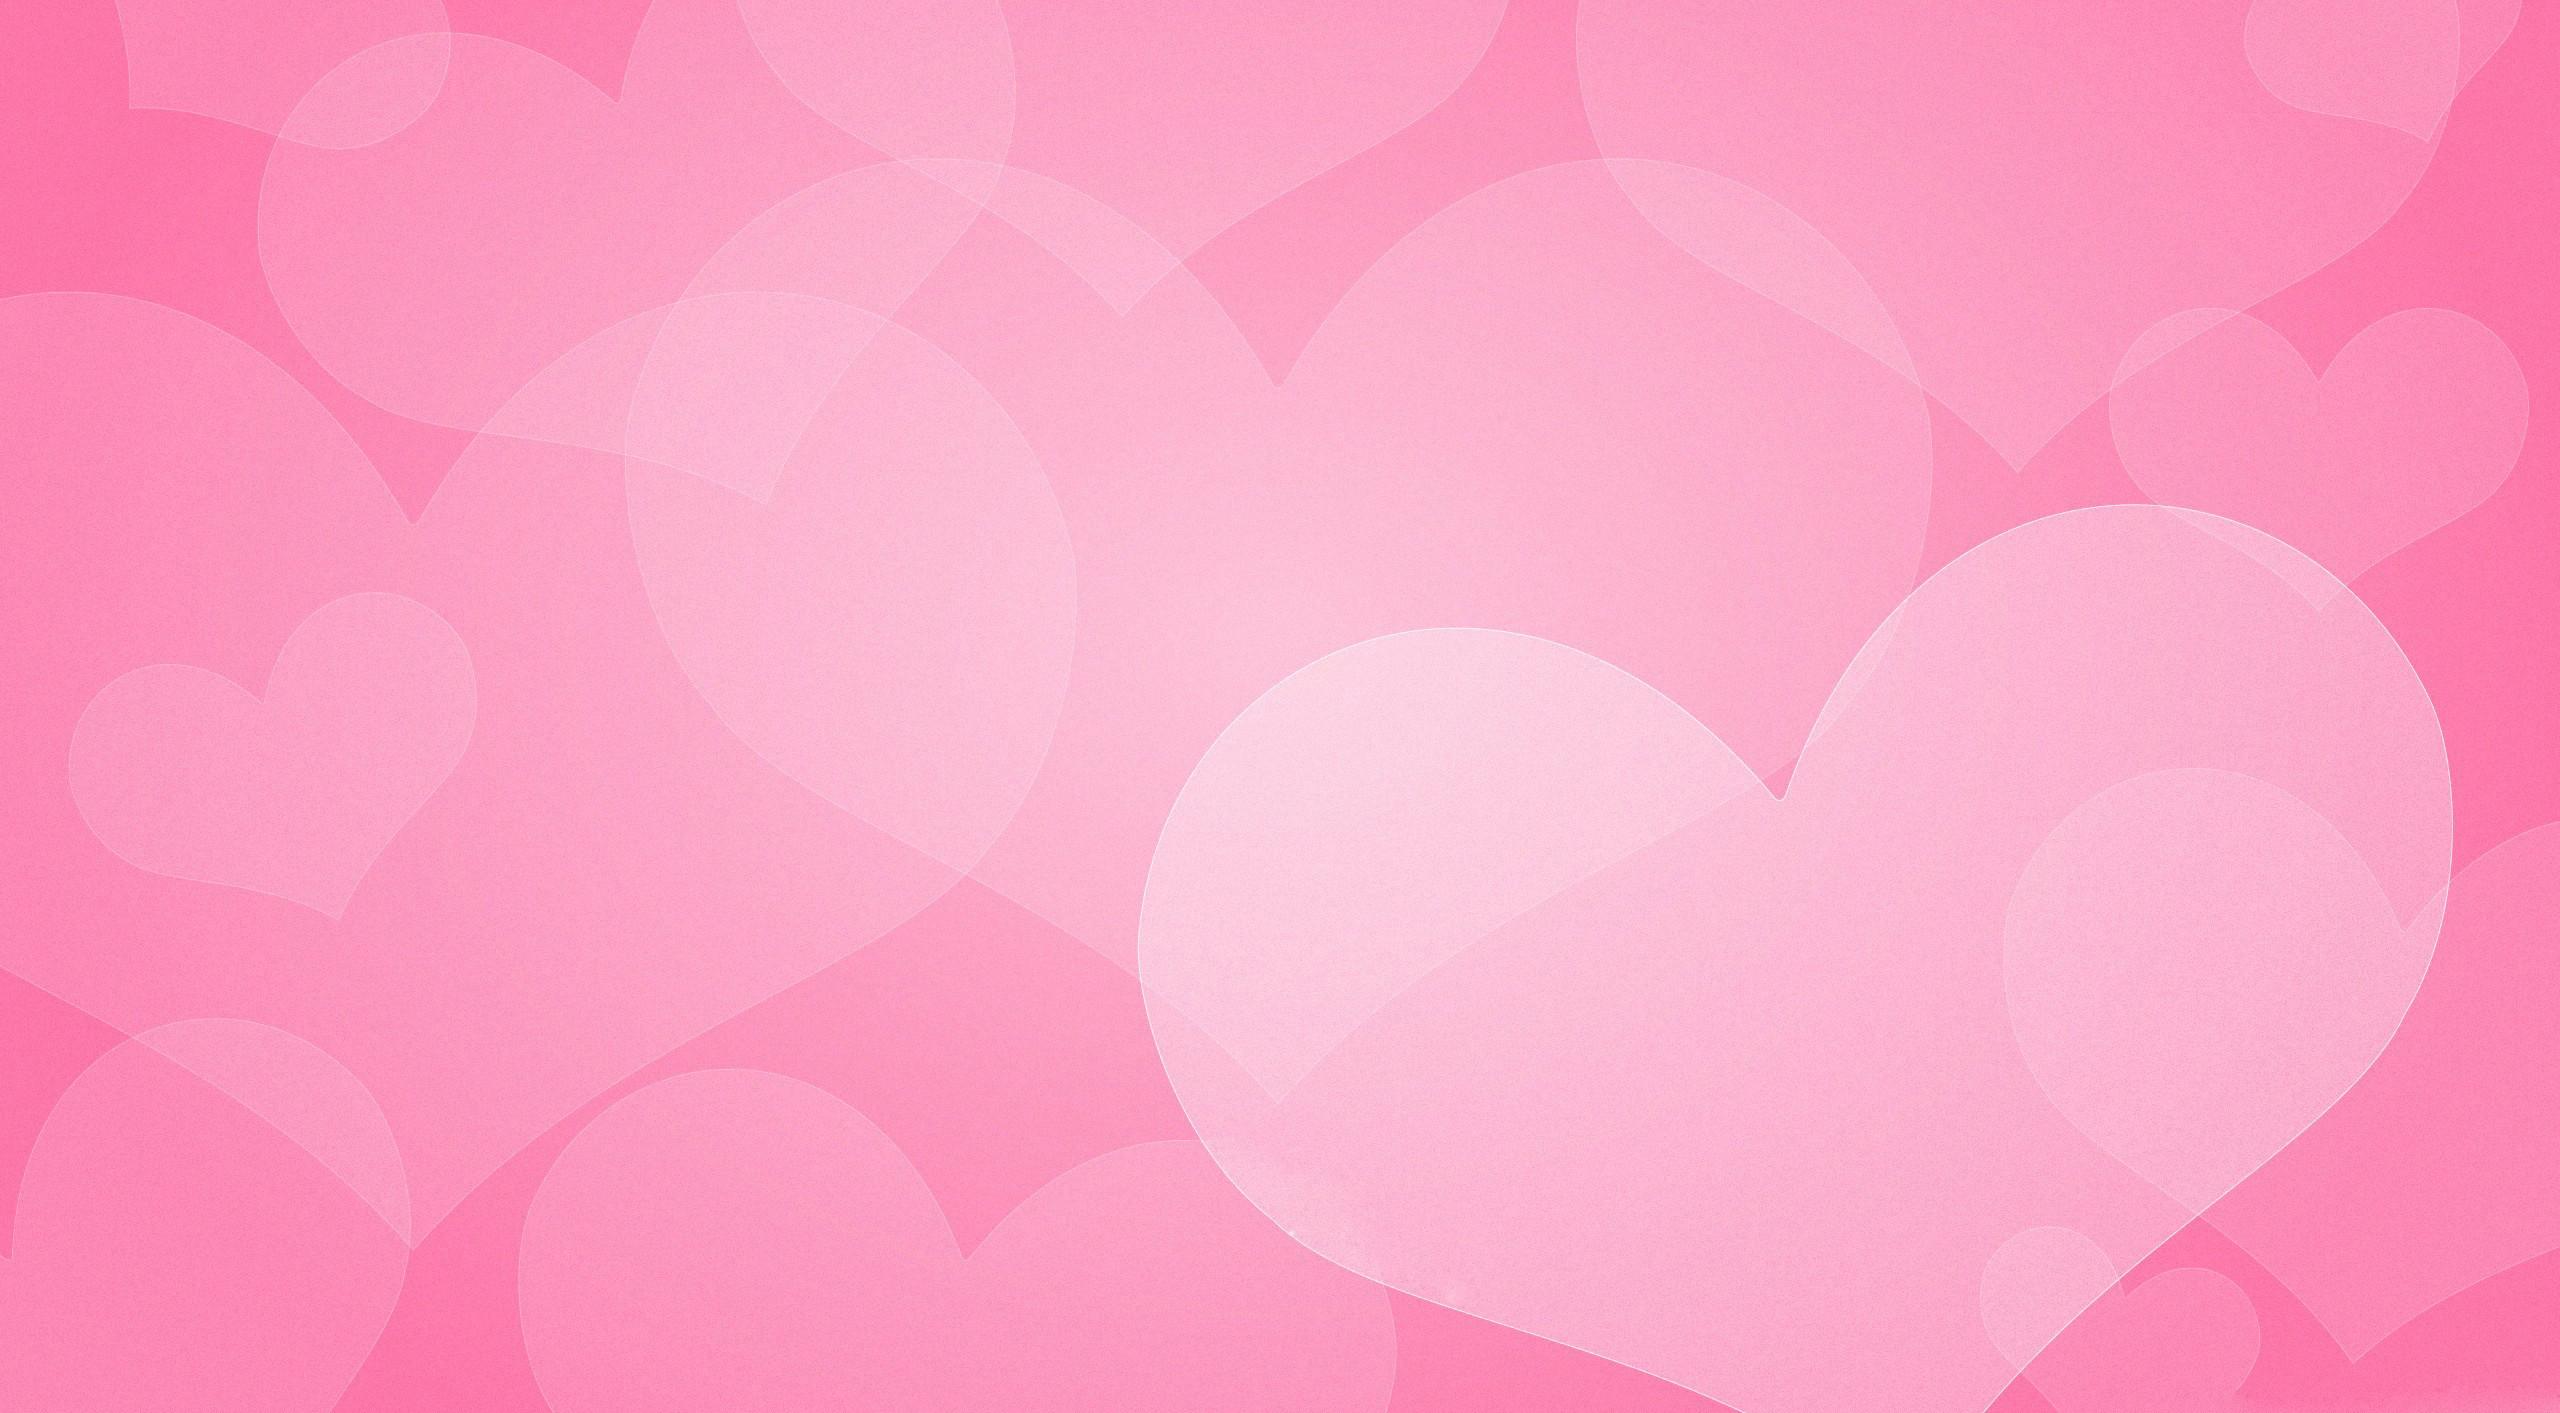 wallpaper.wiki-Plain-Love-Desktop-Background-PIC-WPE0010471